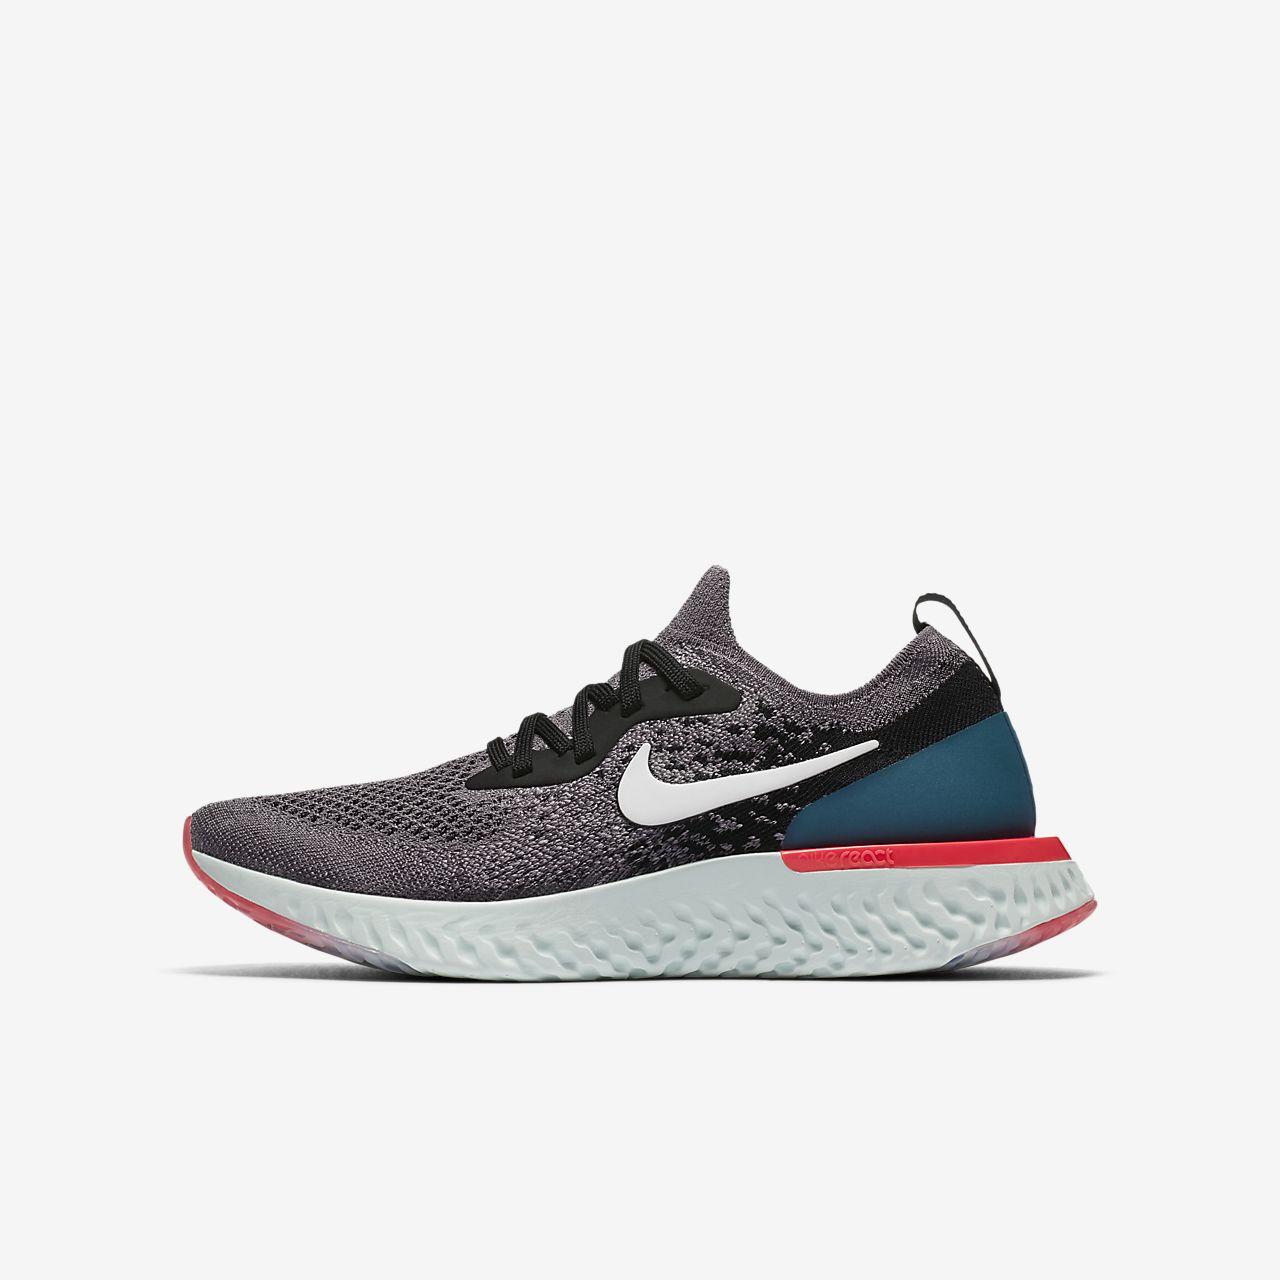 Chaussure Âgé Epic Flyknit React De Running Enfant Pour 1 Nike Plus Yfv6gI7ybm